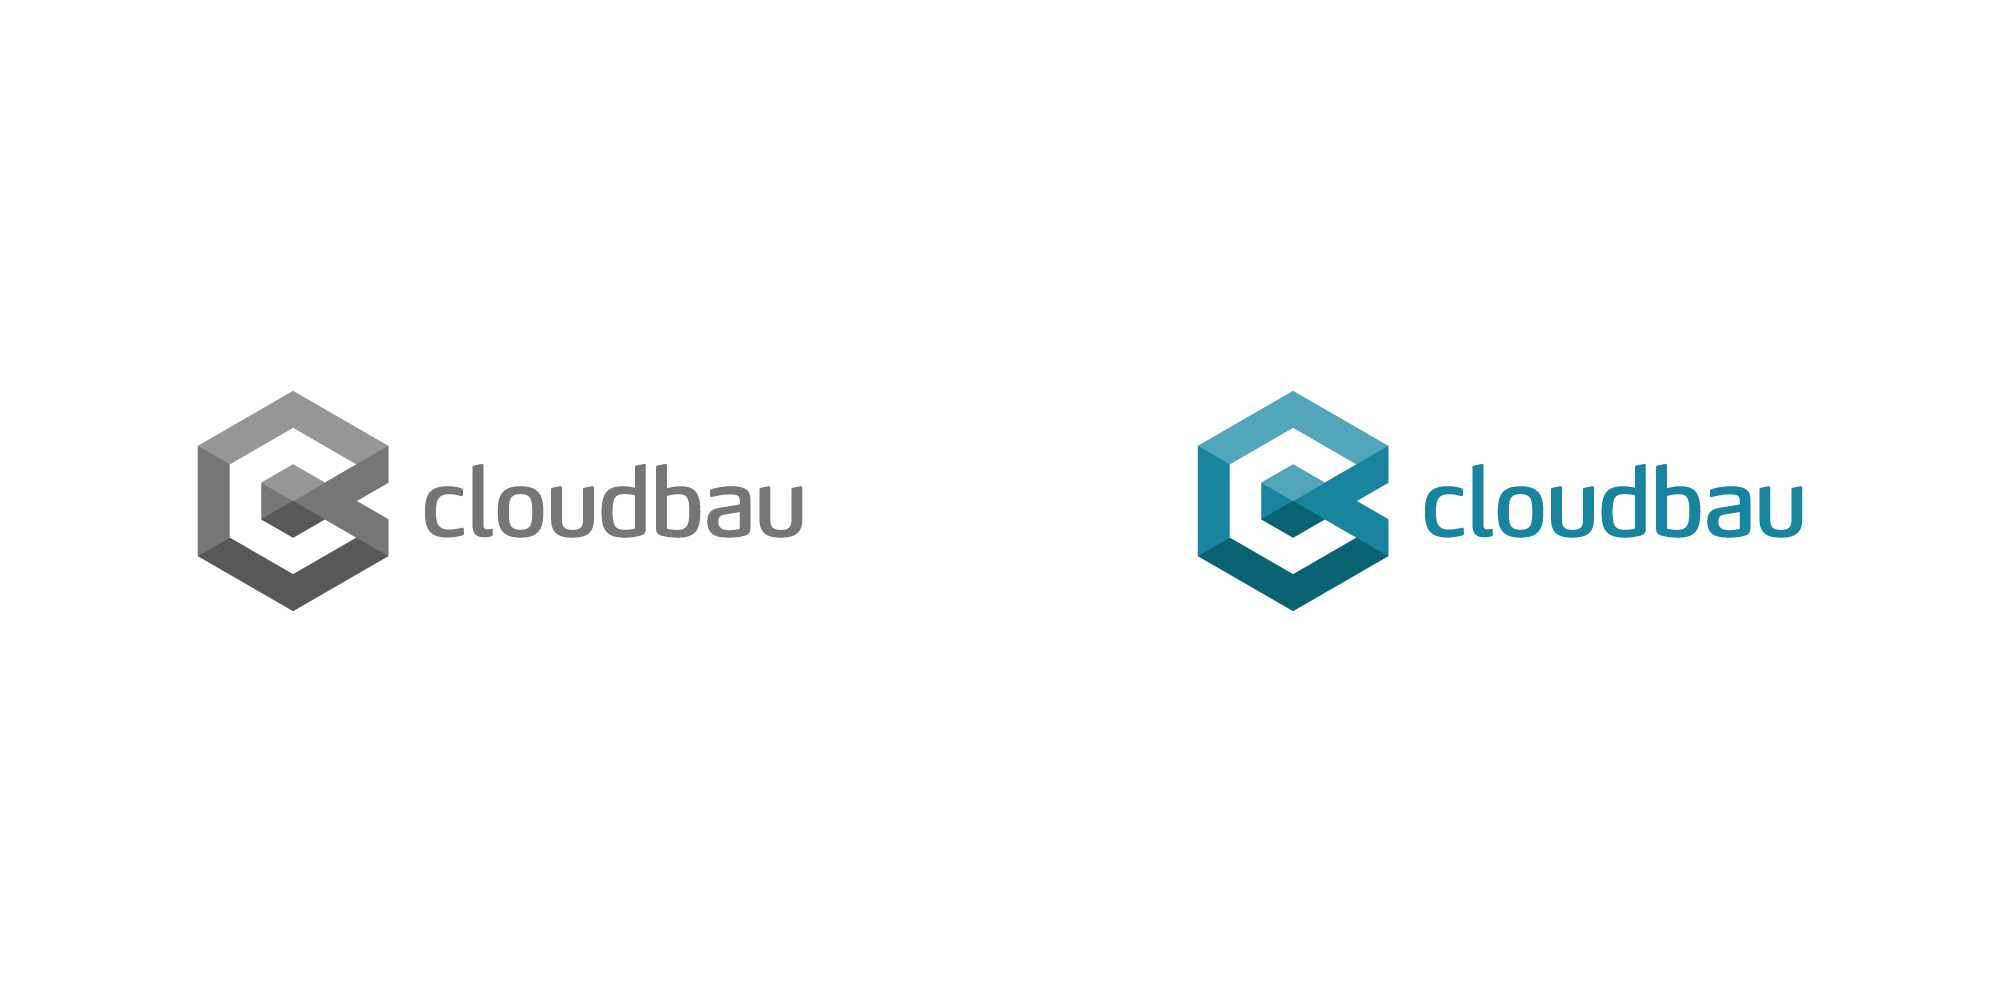 cloudbau06